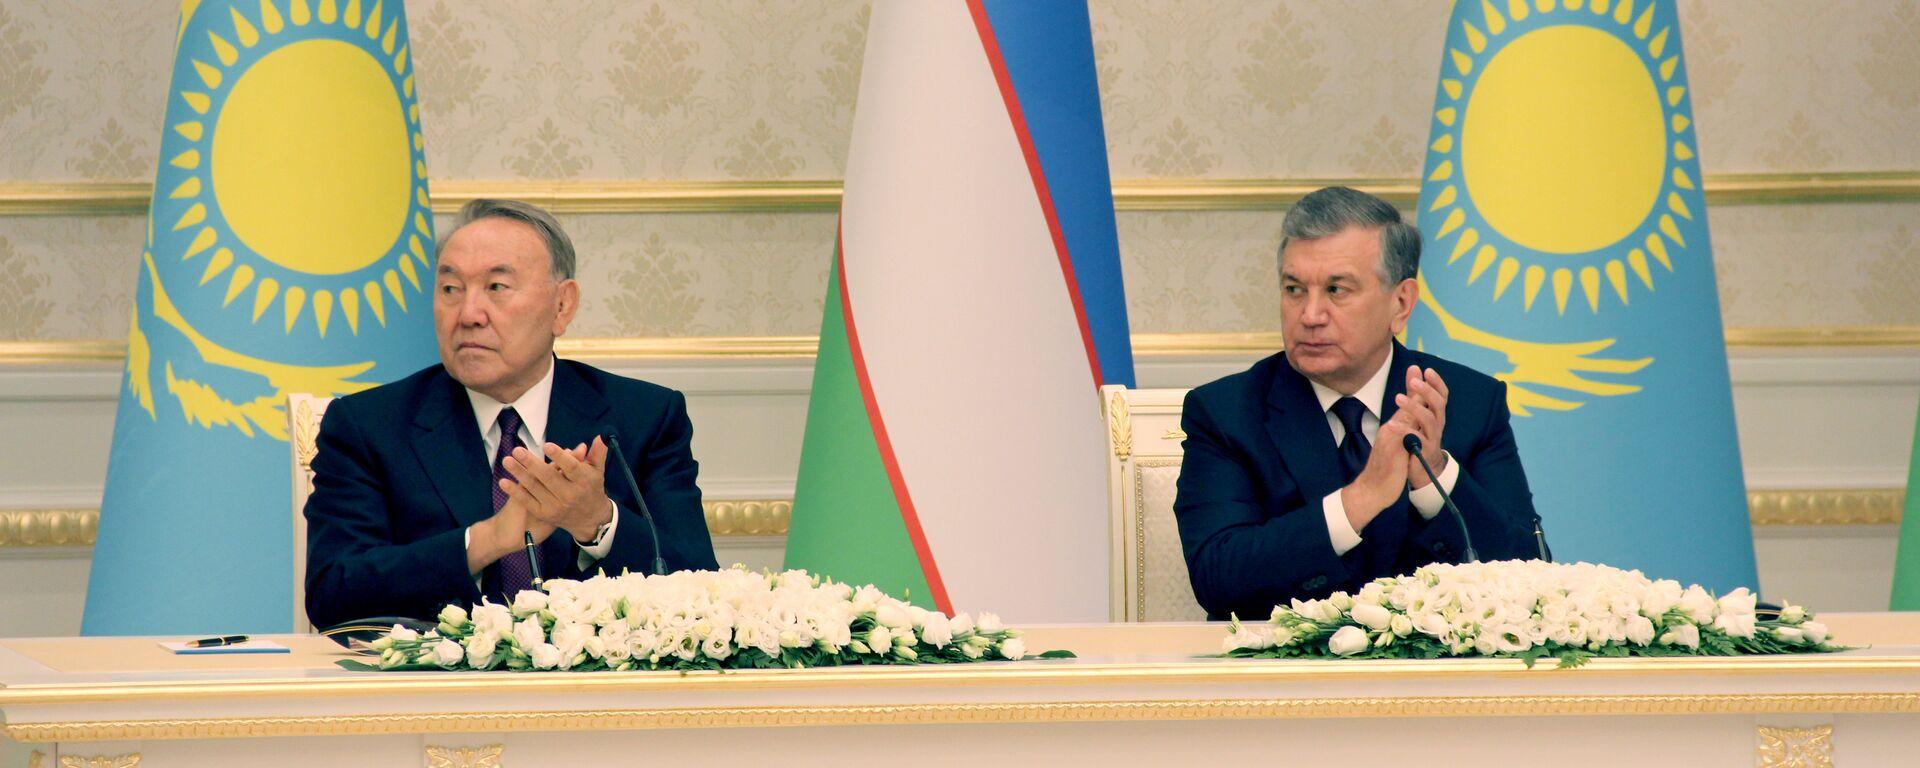 Президенты Узбекистана и Казахстана Шавкат Мирзиёев и Нурсултан Назарбаев - Sputnik Узбекистан, 1920, 06.07.2021